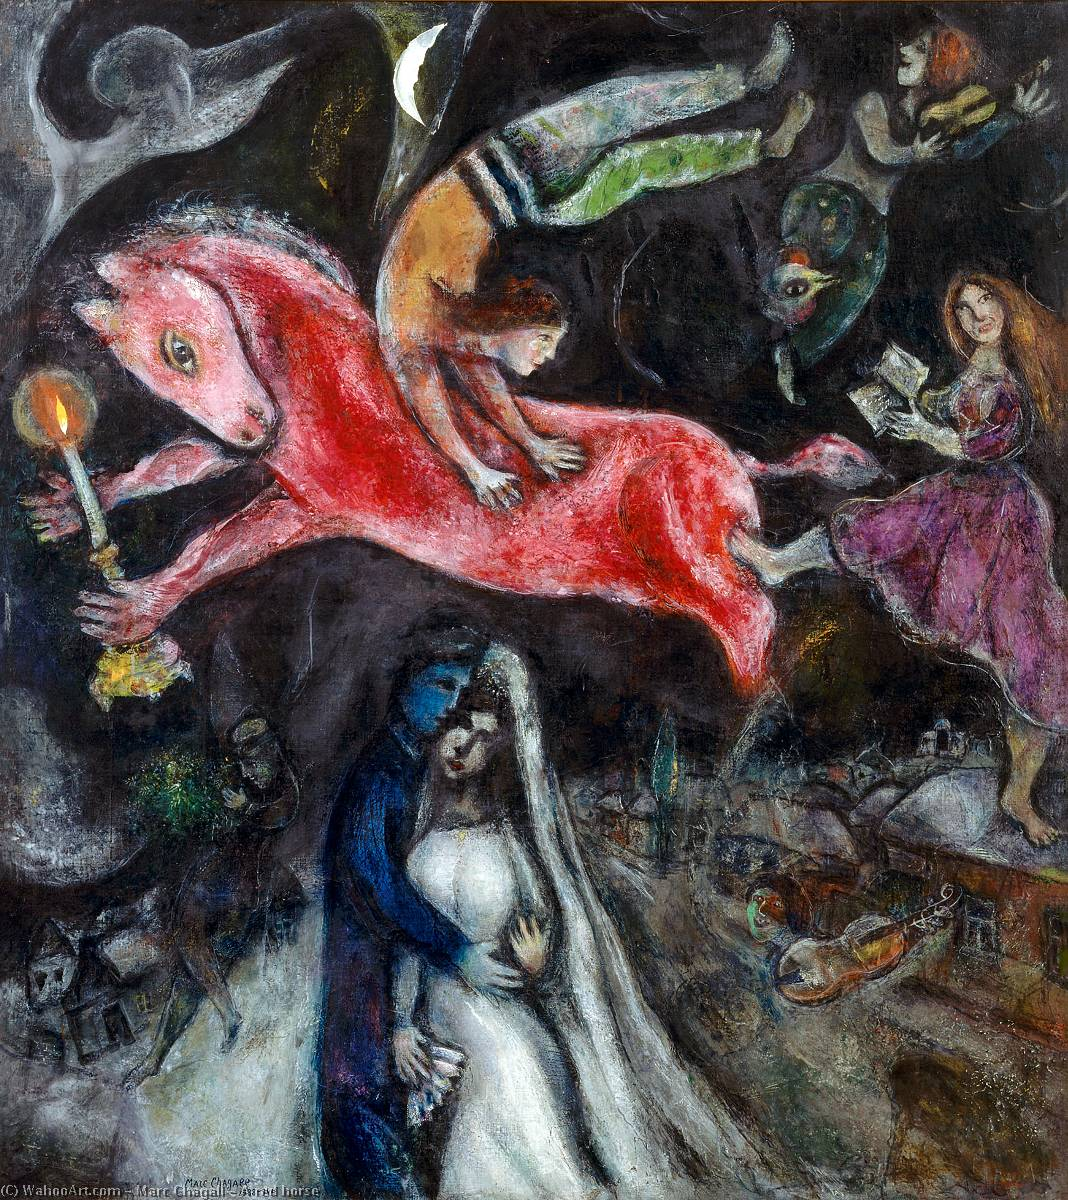 a rojo caballo, óleo sobre lienzo de Marc Chagall (1887-1985, Belarus)